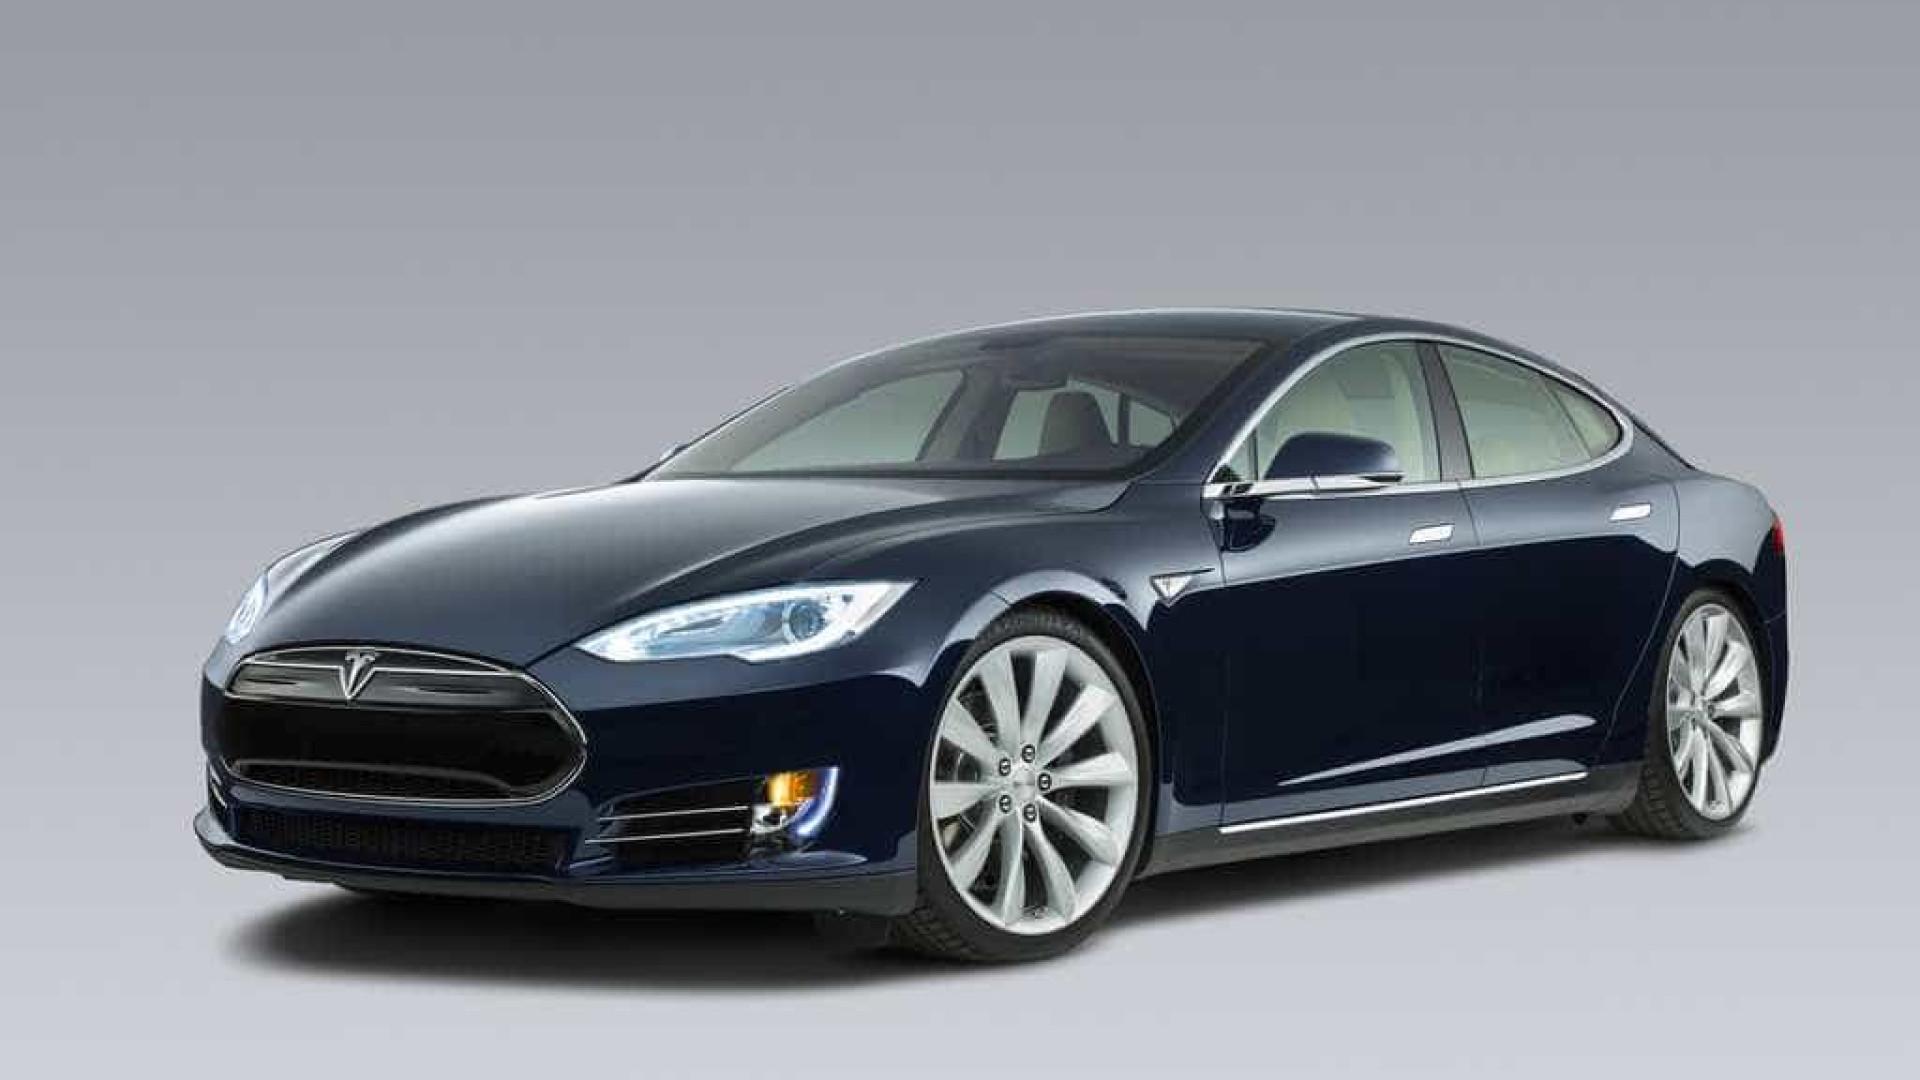 Tesla abandonou o seu modelo mais acessível